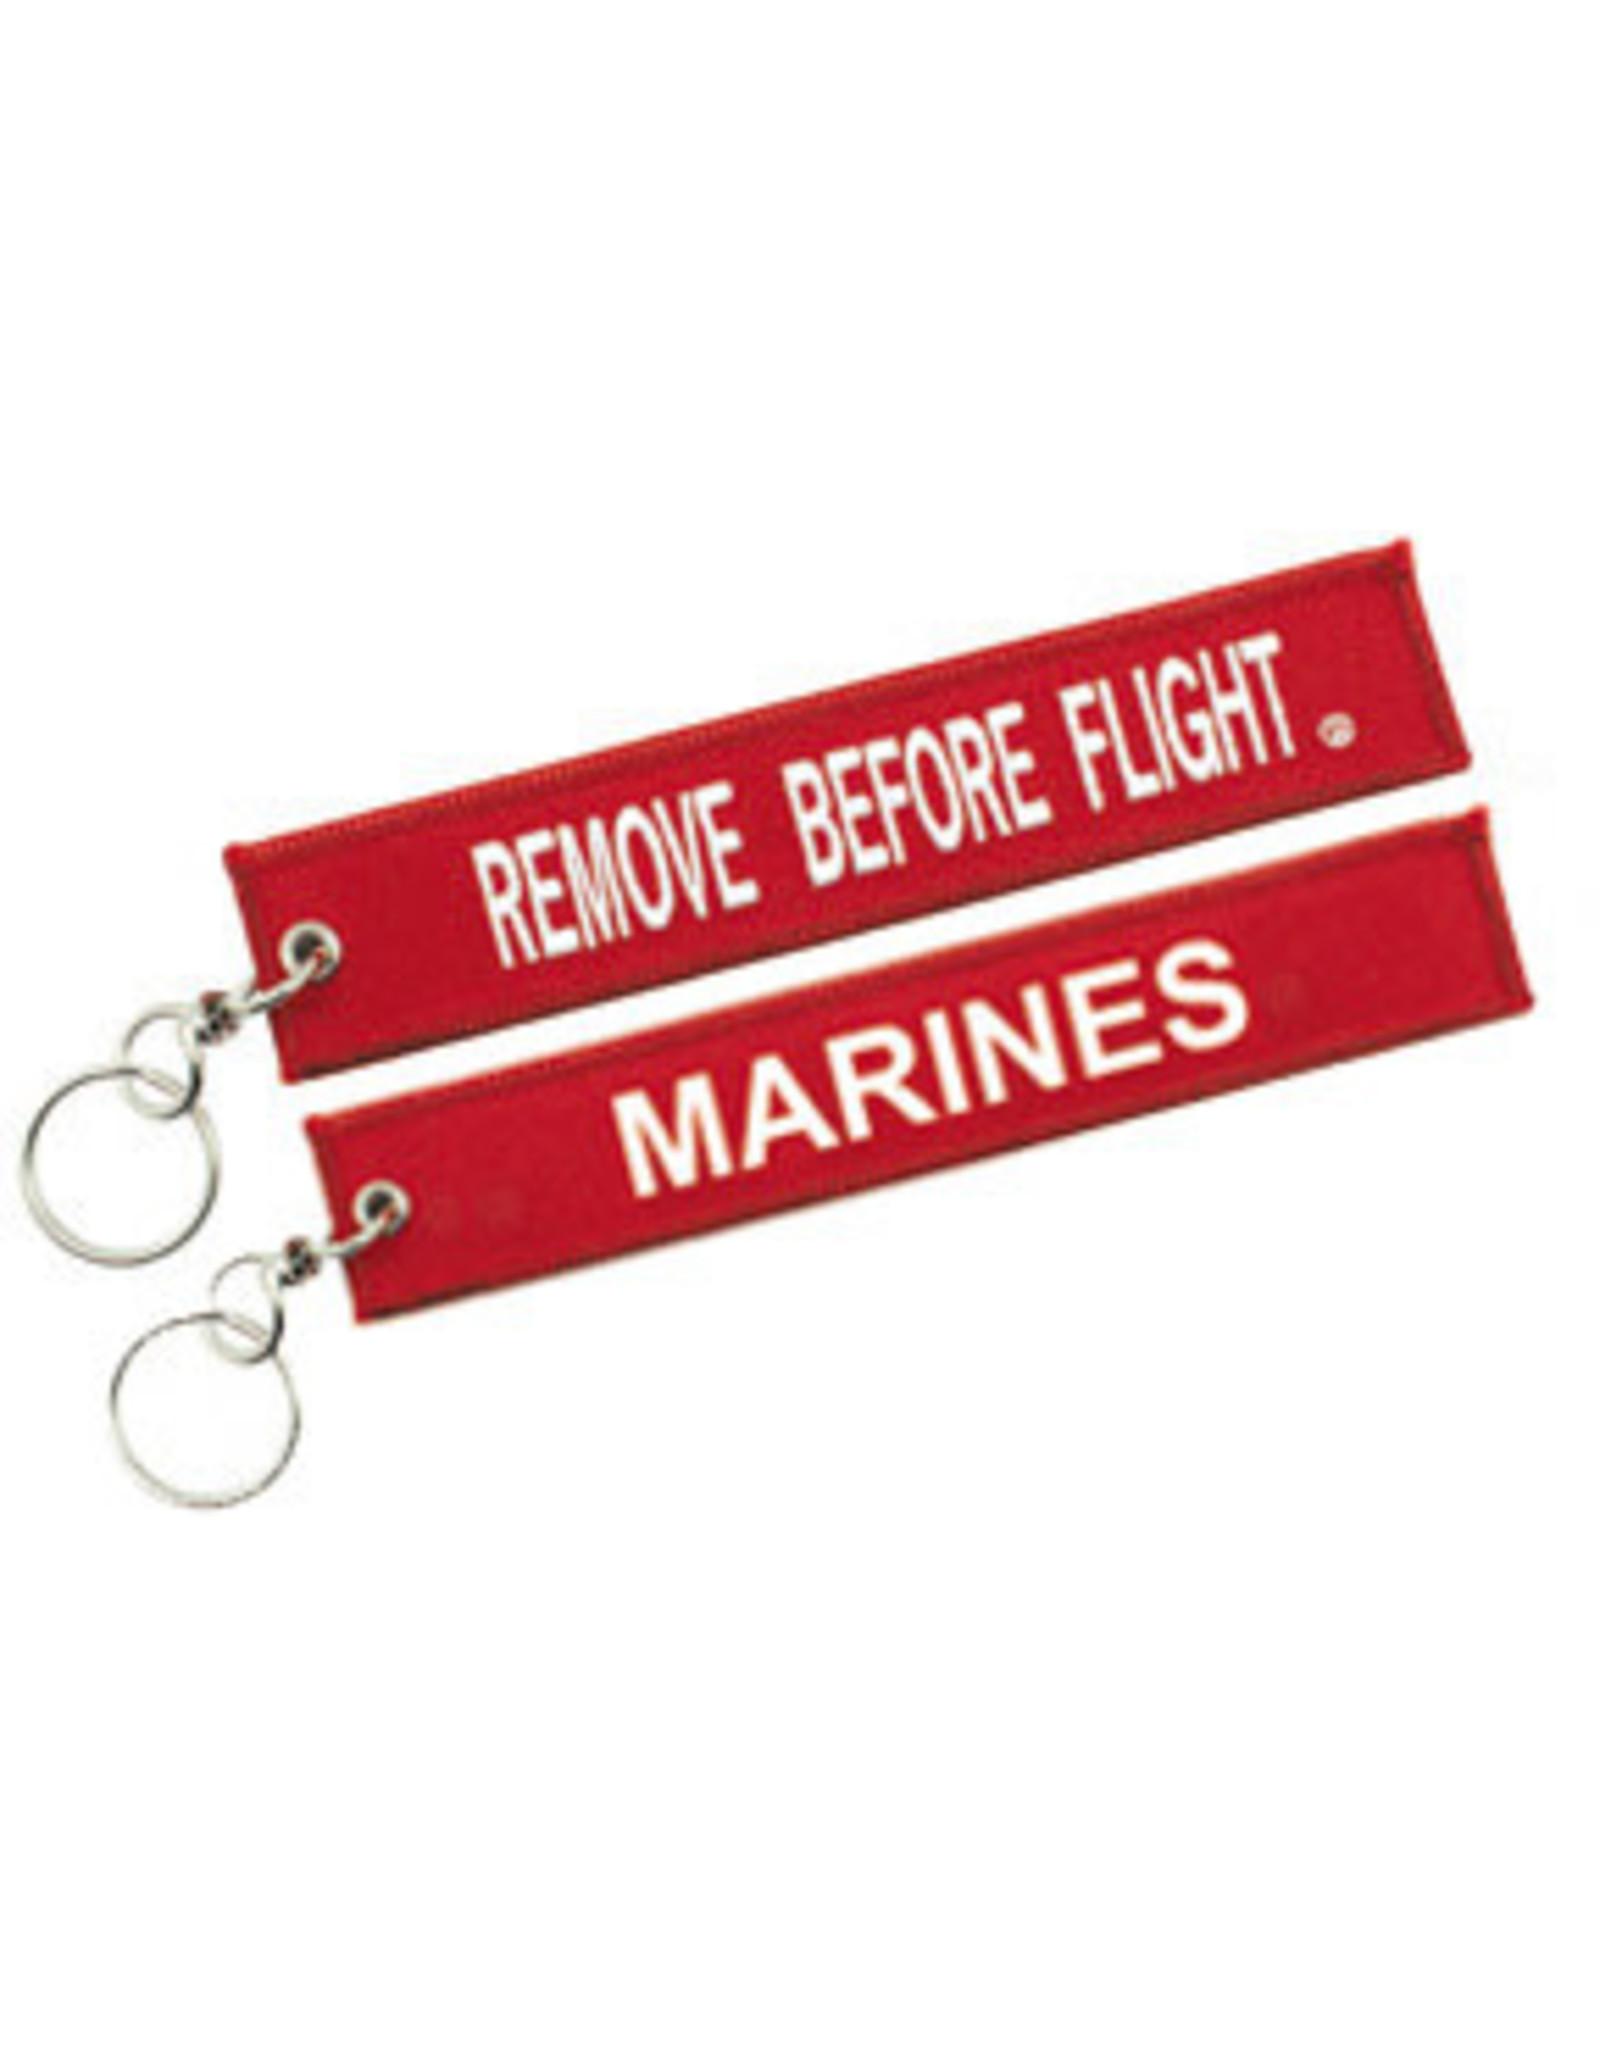 USMC Embroidered Key Chain